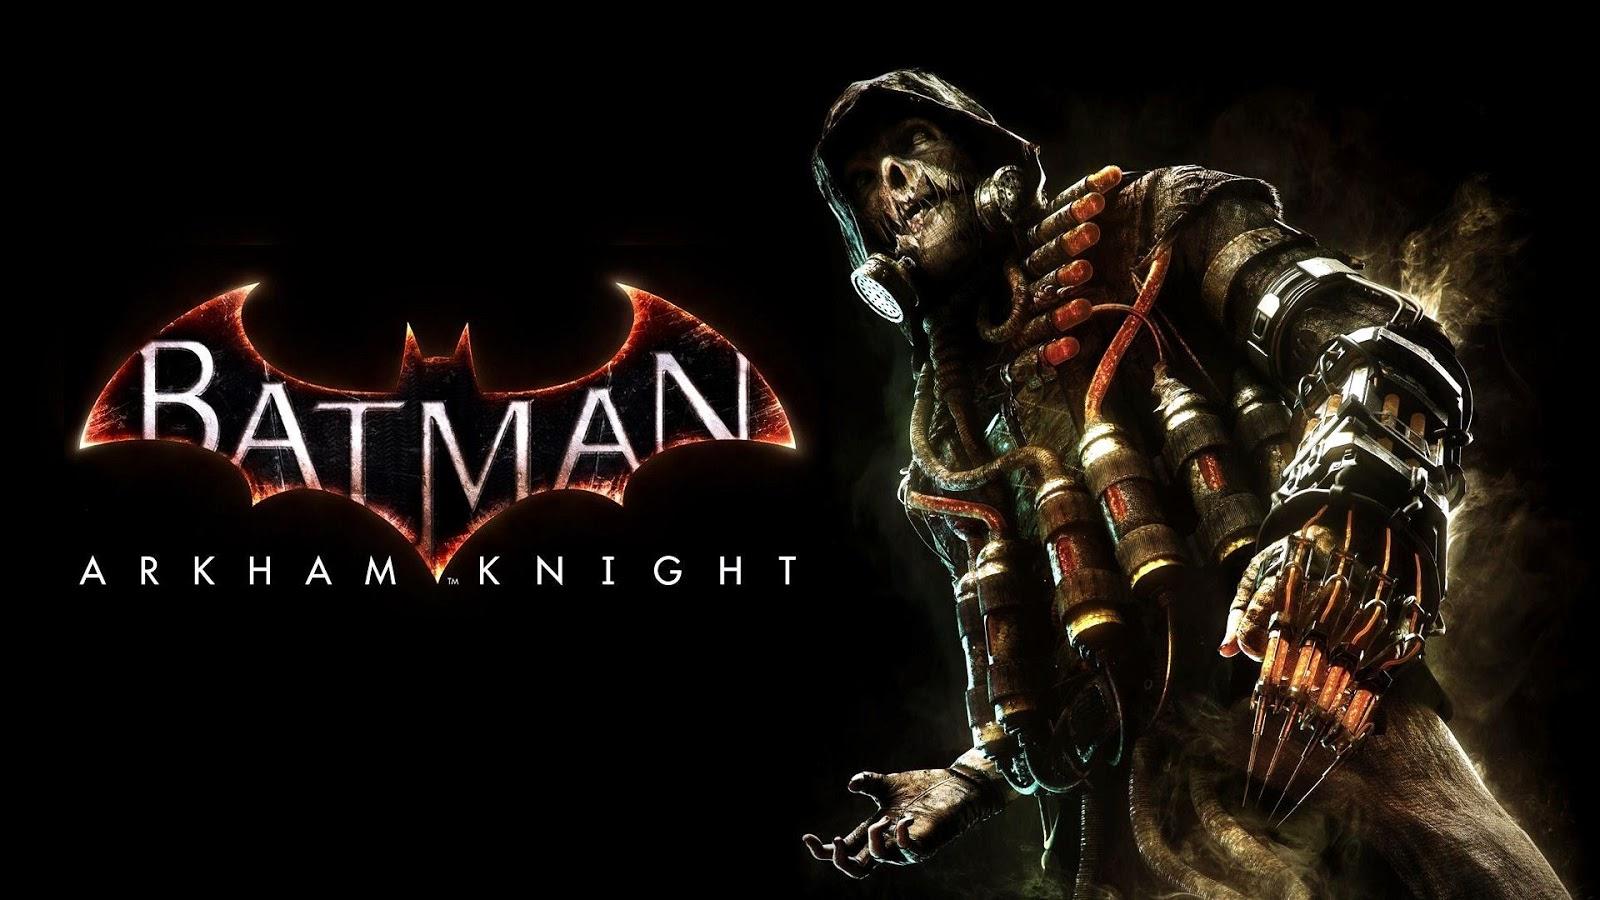 Batman: Arkham Knight Free Download For PC | BopaGames App